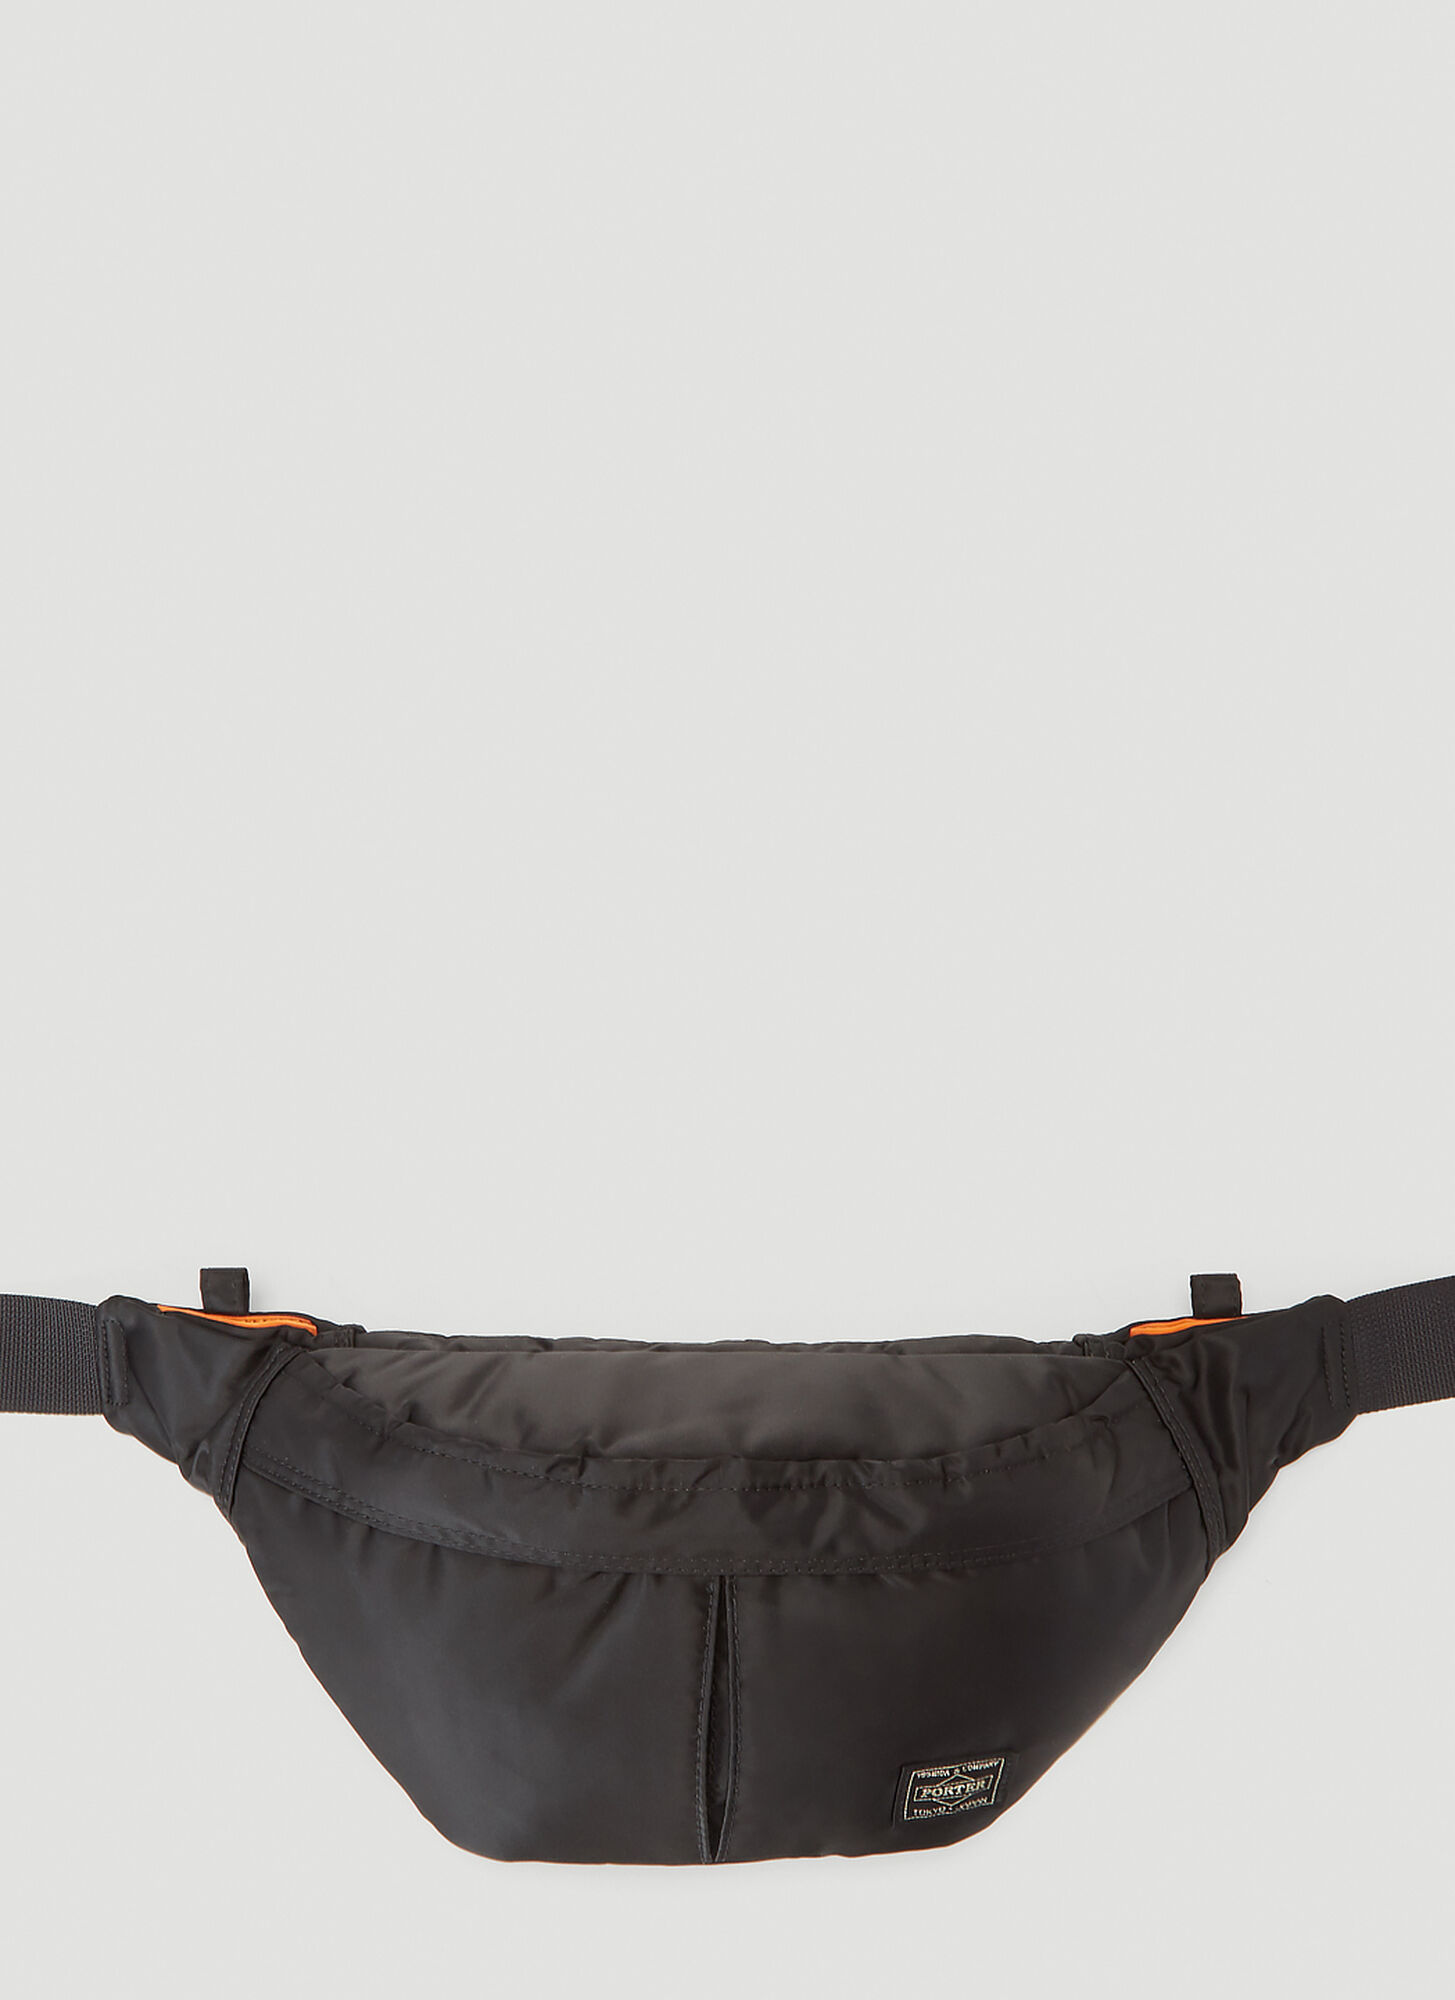 unisex Black 100% Nylon.